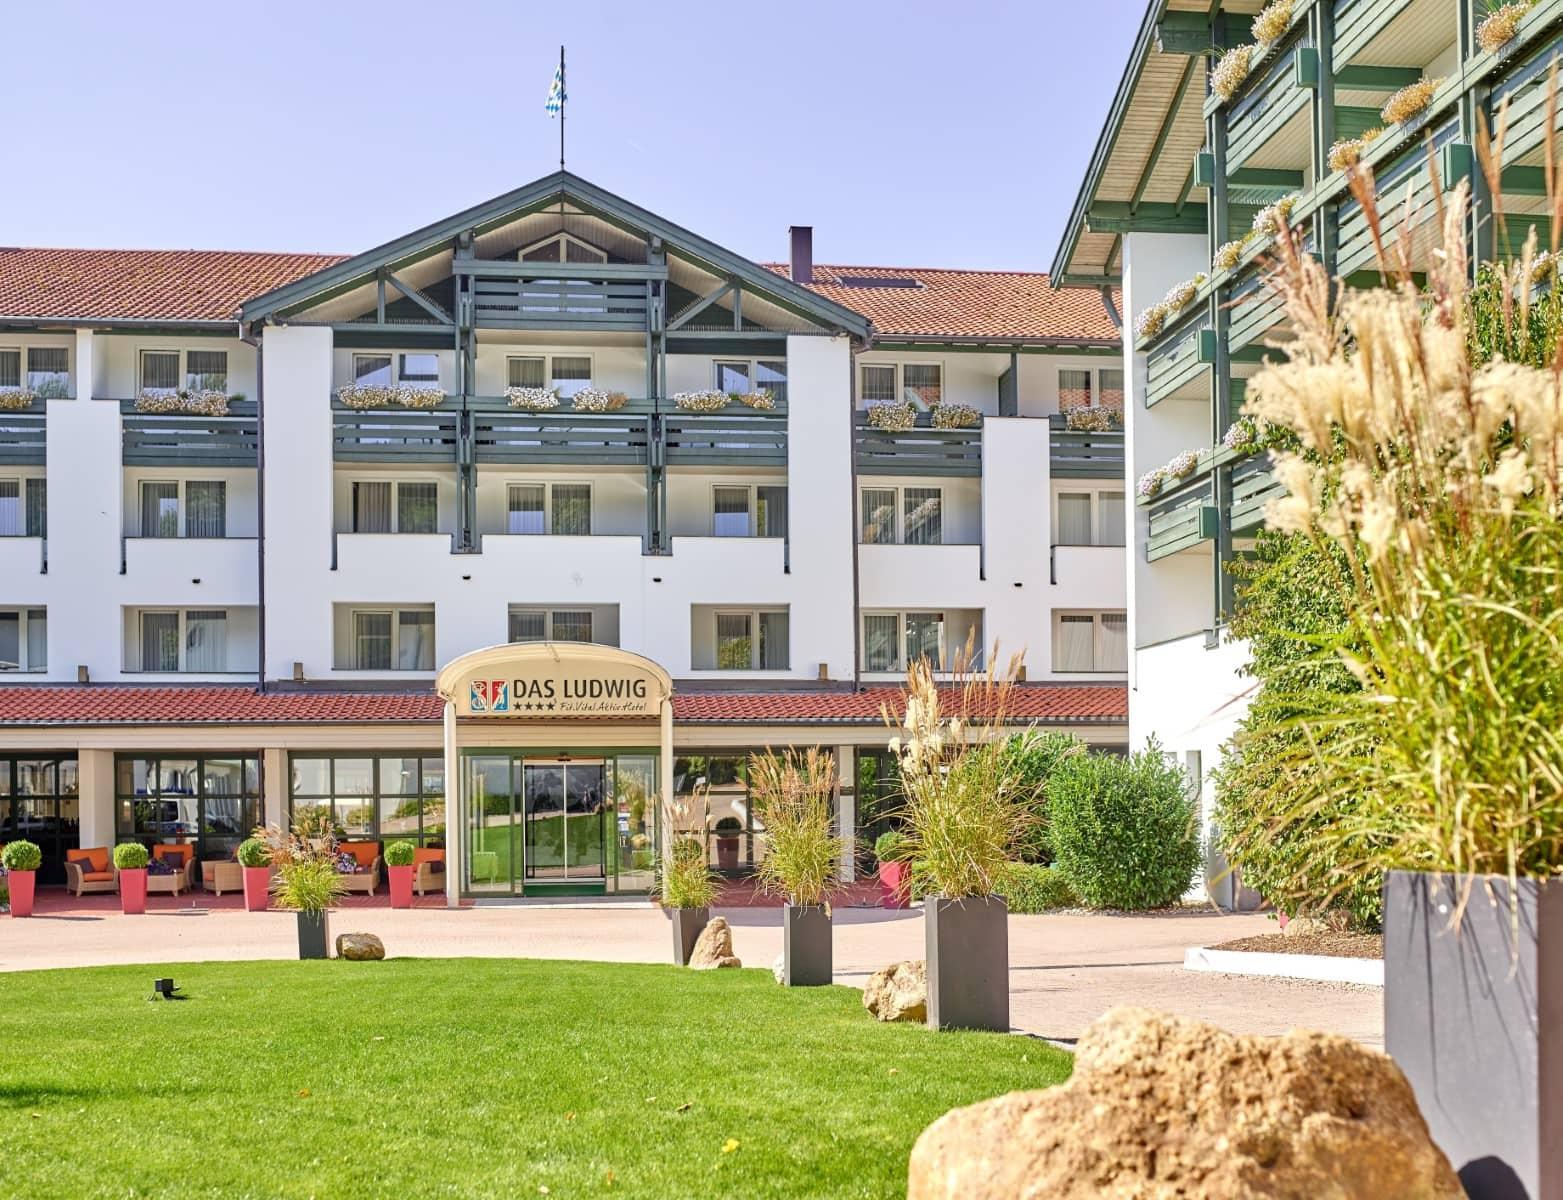 Hotel Das Ludwig sucht Kinderhotel-Tester // HIMBEER